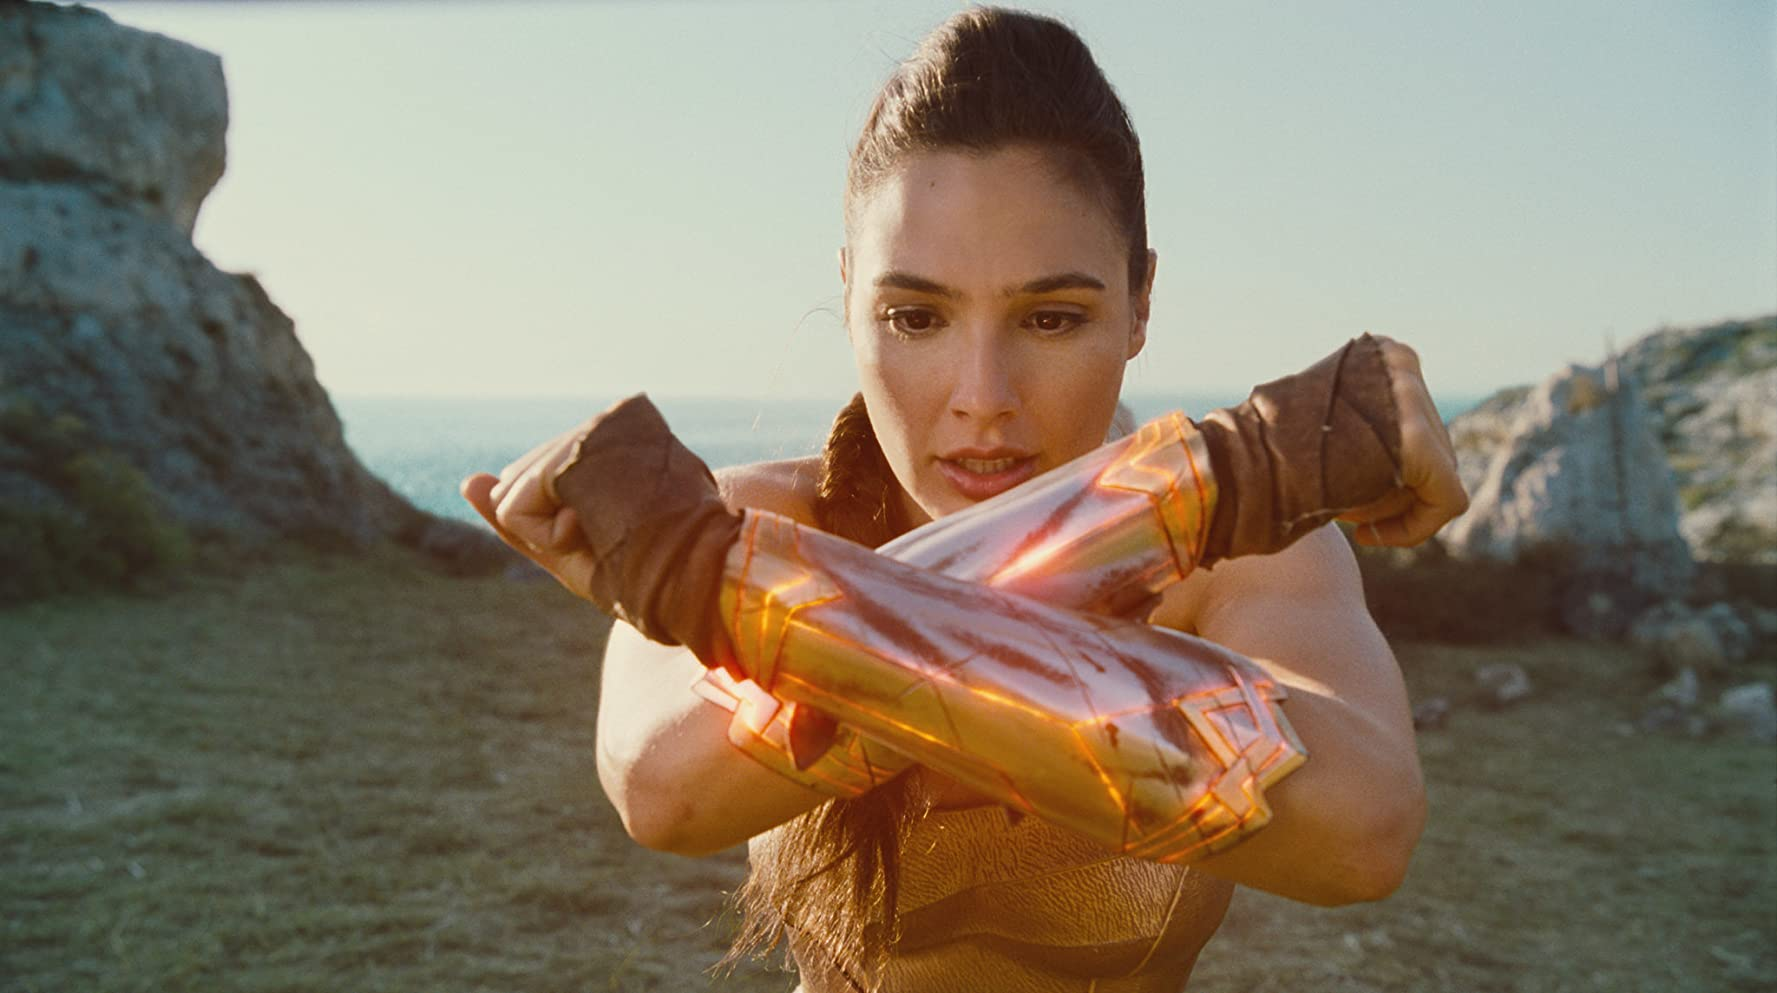 wonder woman u0027 and greek gods at war the mythology behind the film